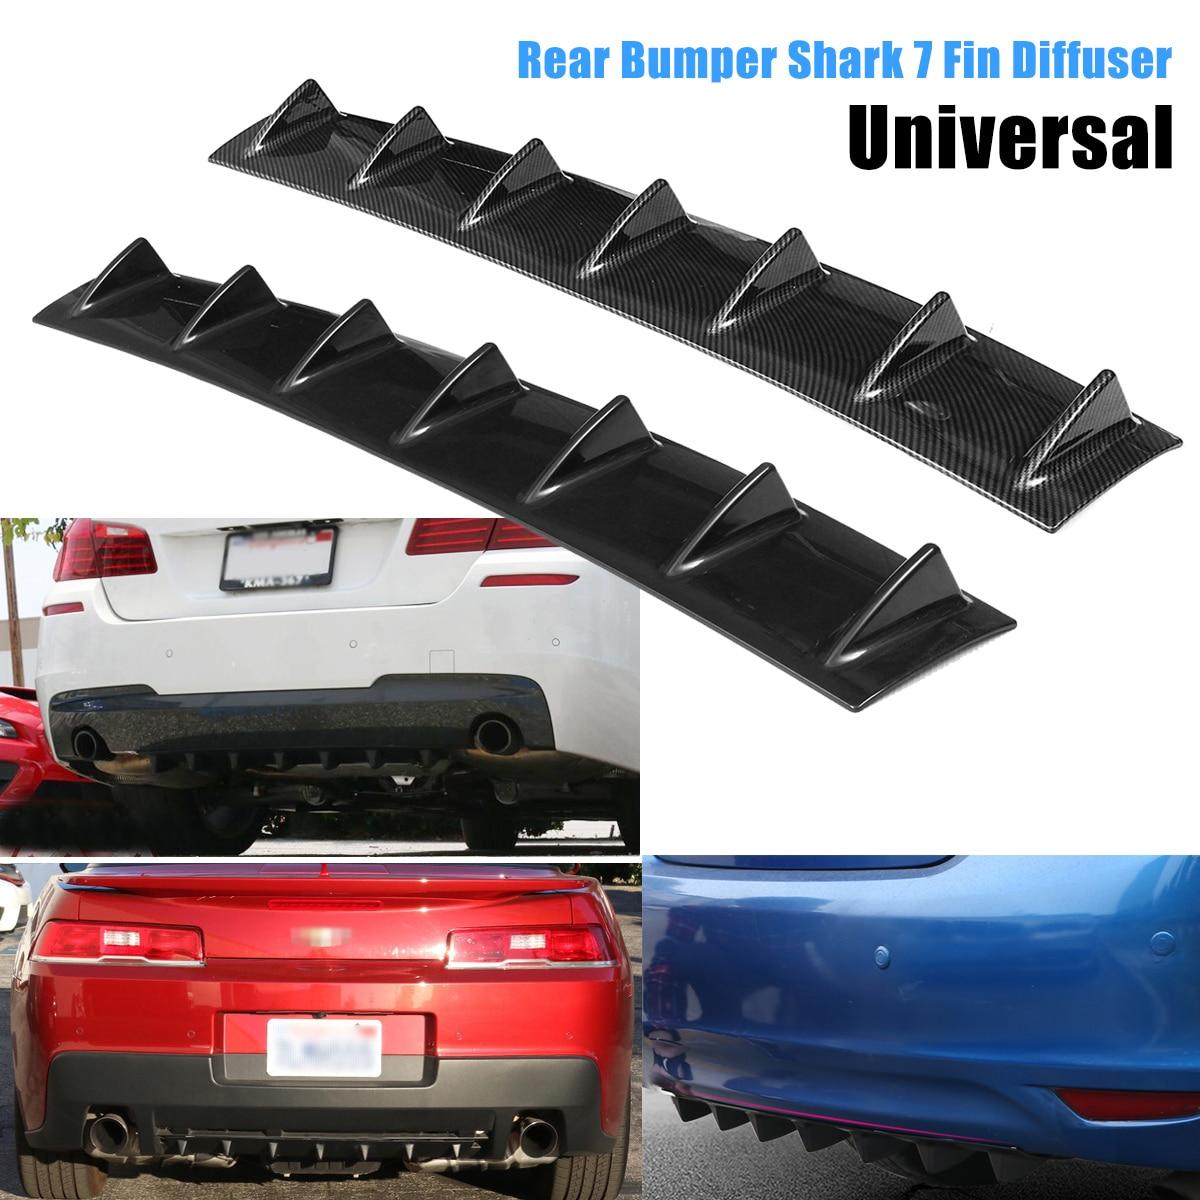 Universal 33 X 5 ABS Car Rear Bumper Shark Fin 7 Wings Lip Diffuser Spoiler Kit Lower Car Splitter